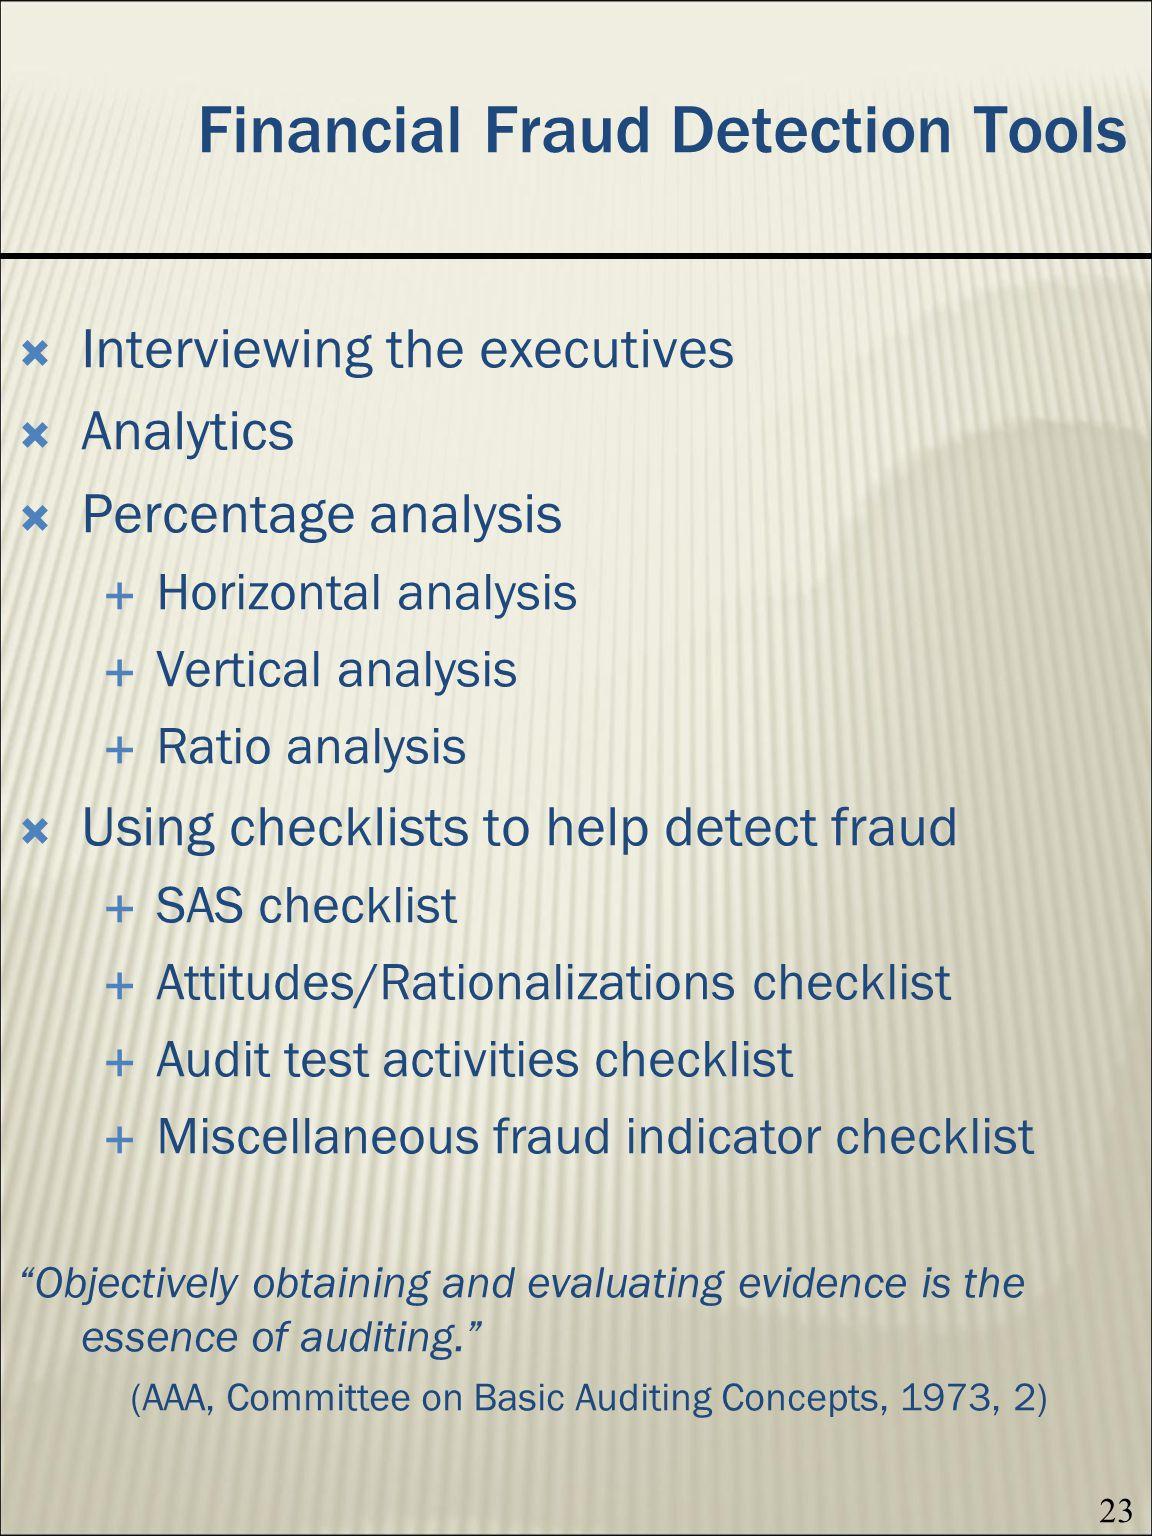 Financial Fraud Detection Tools